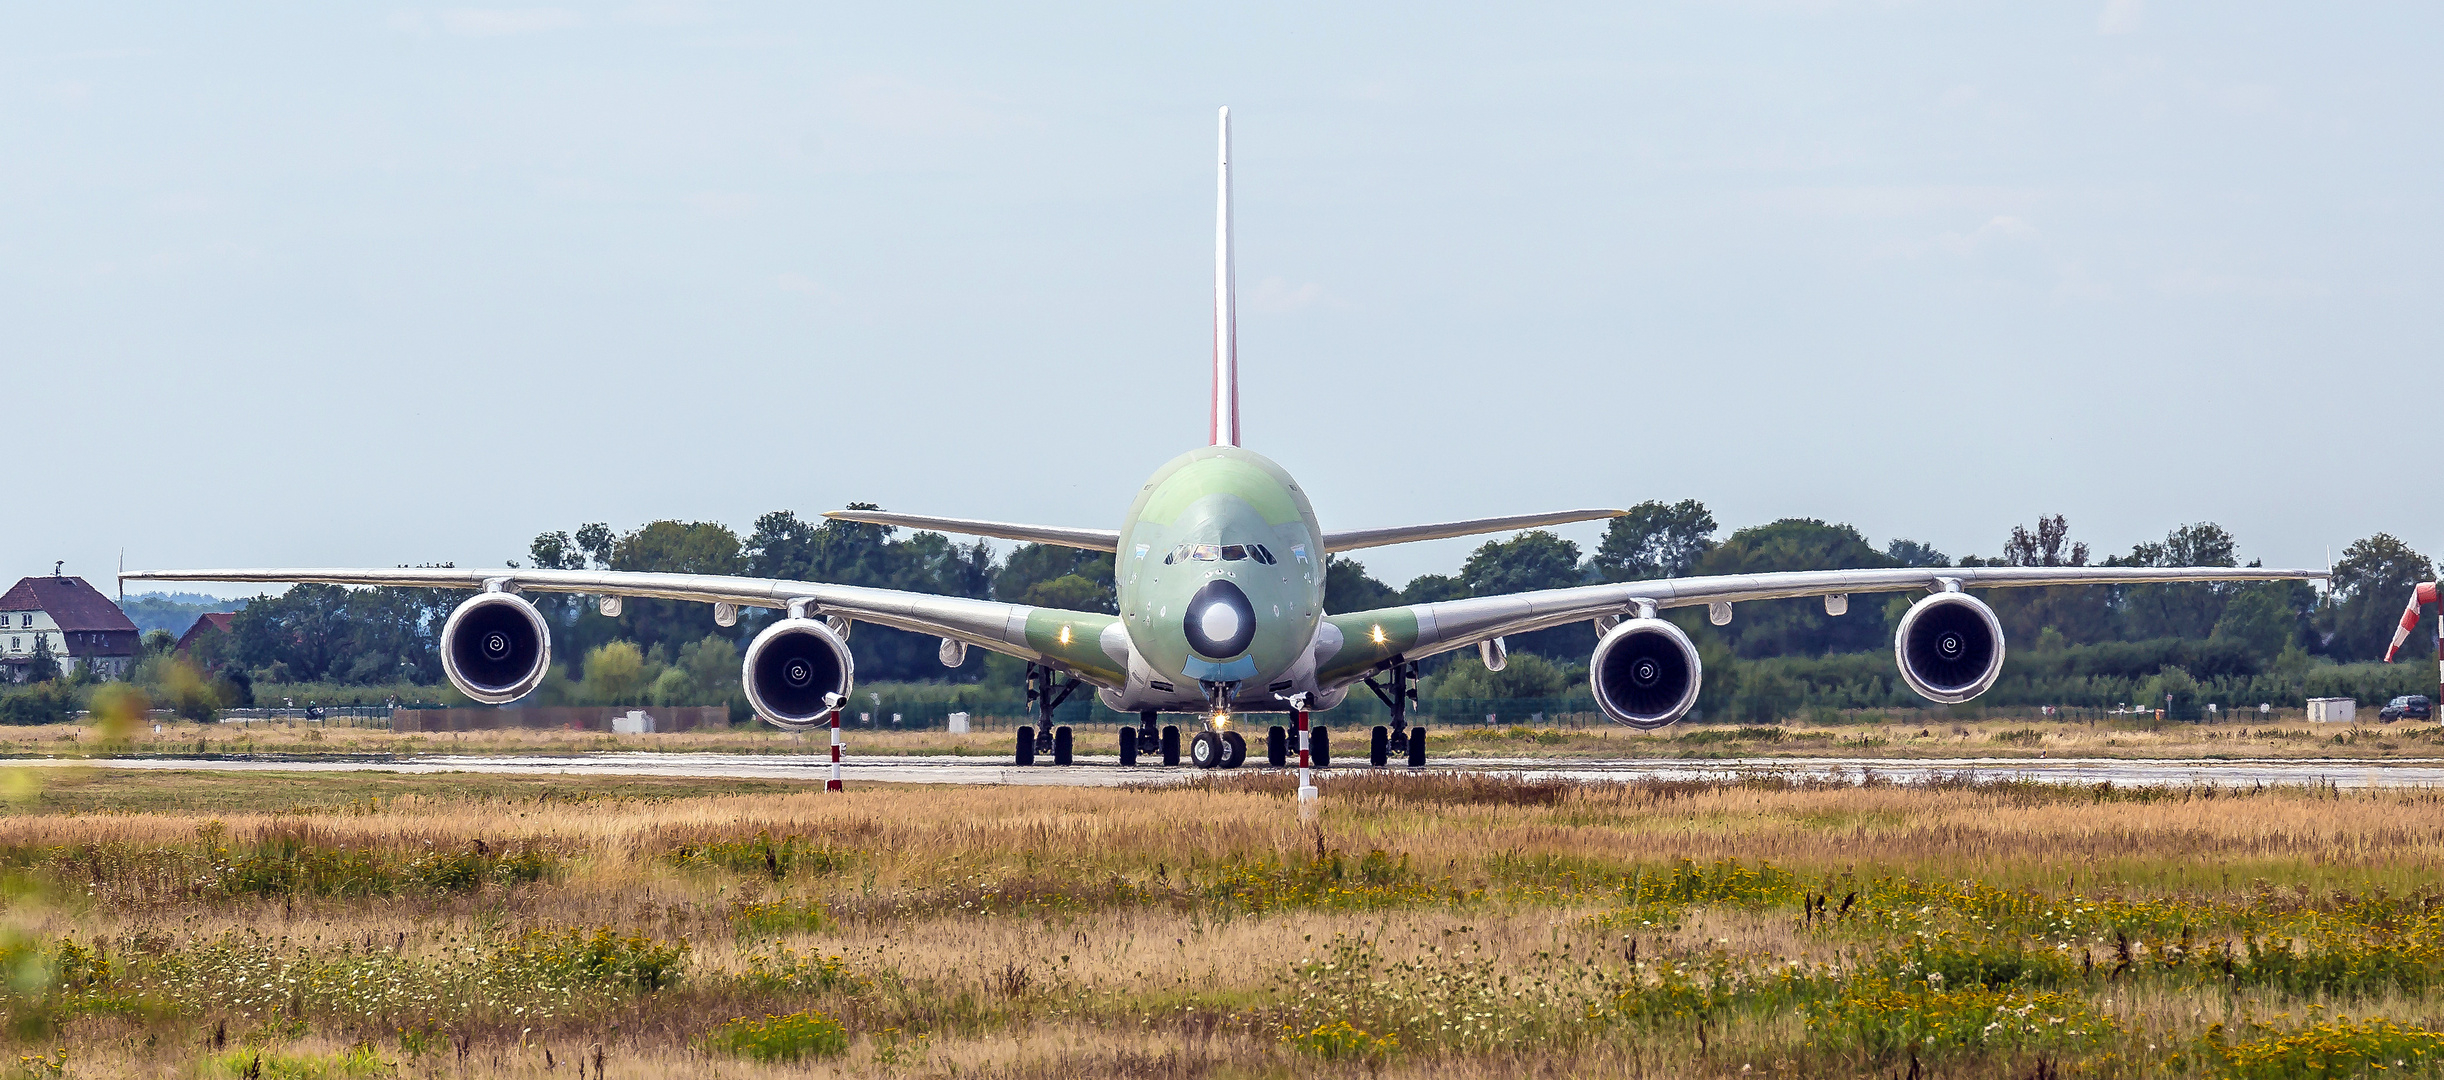 73 Meter Flügelspannweite, Wow